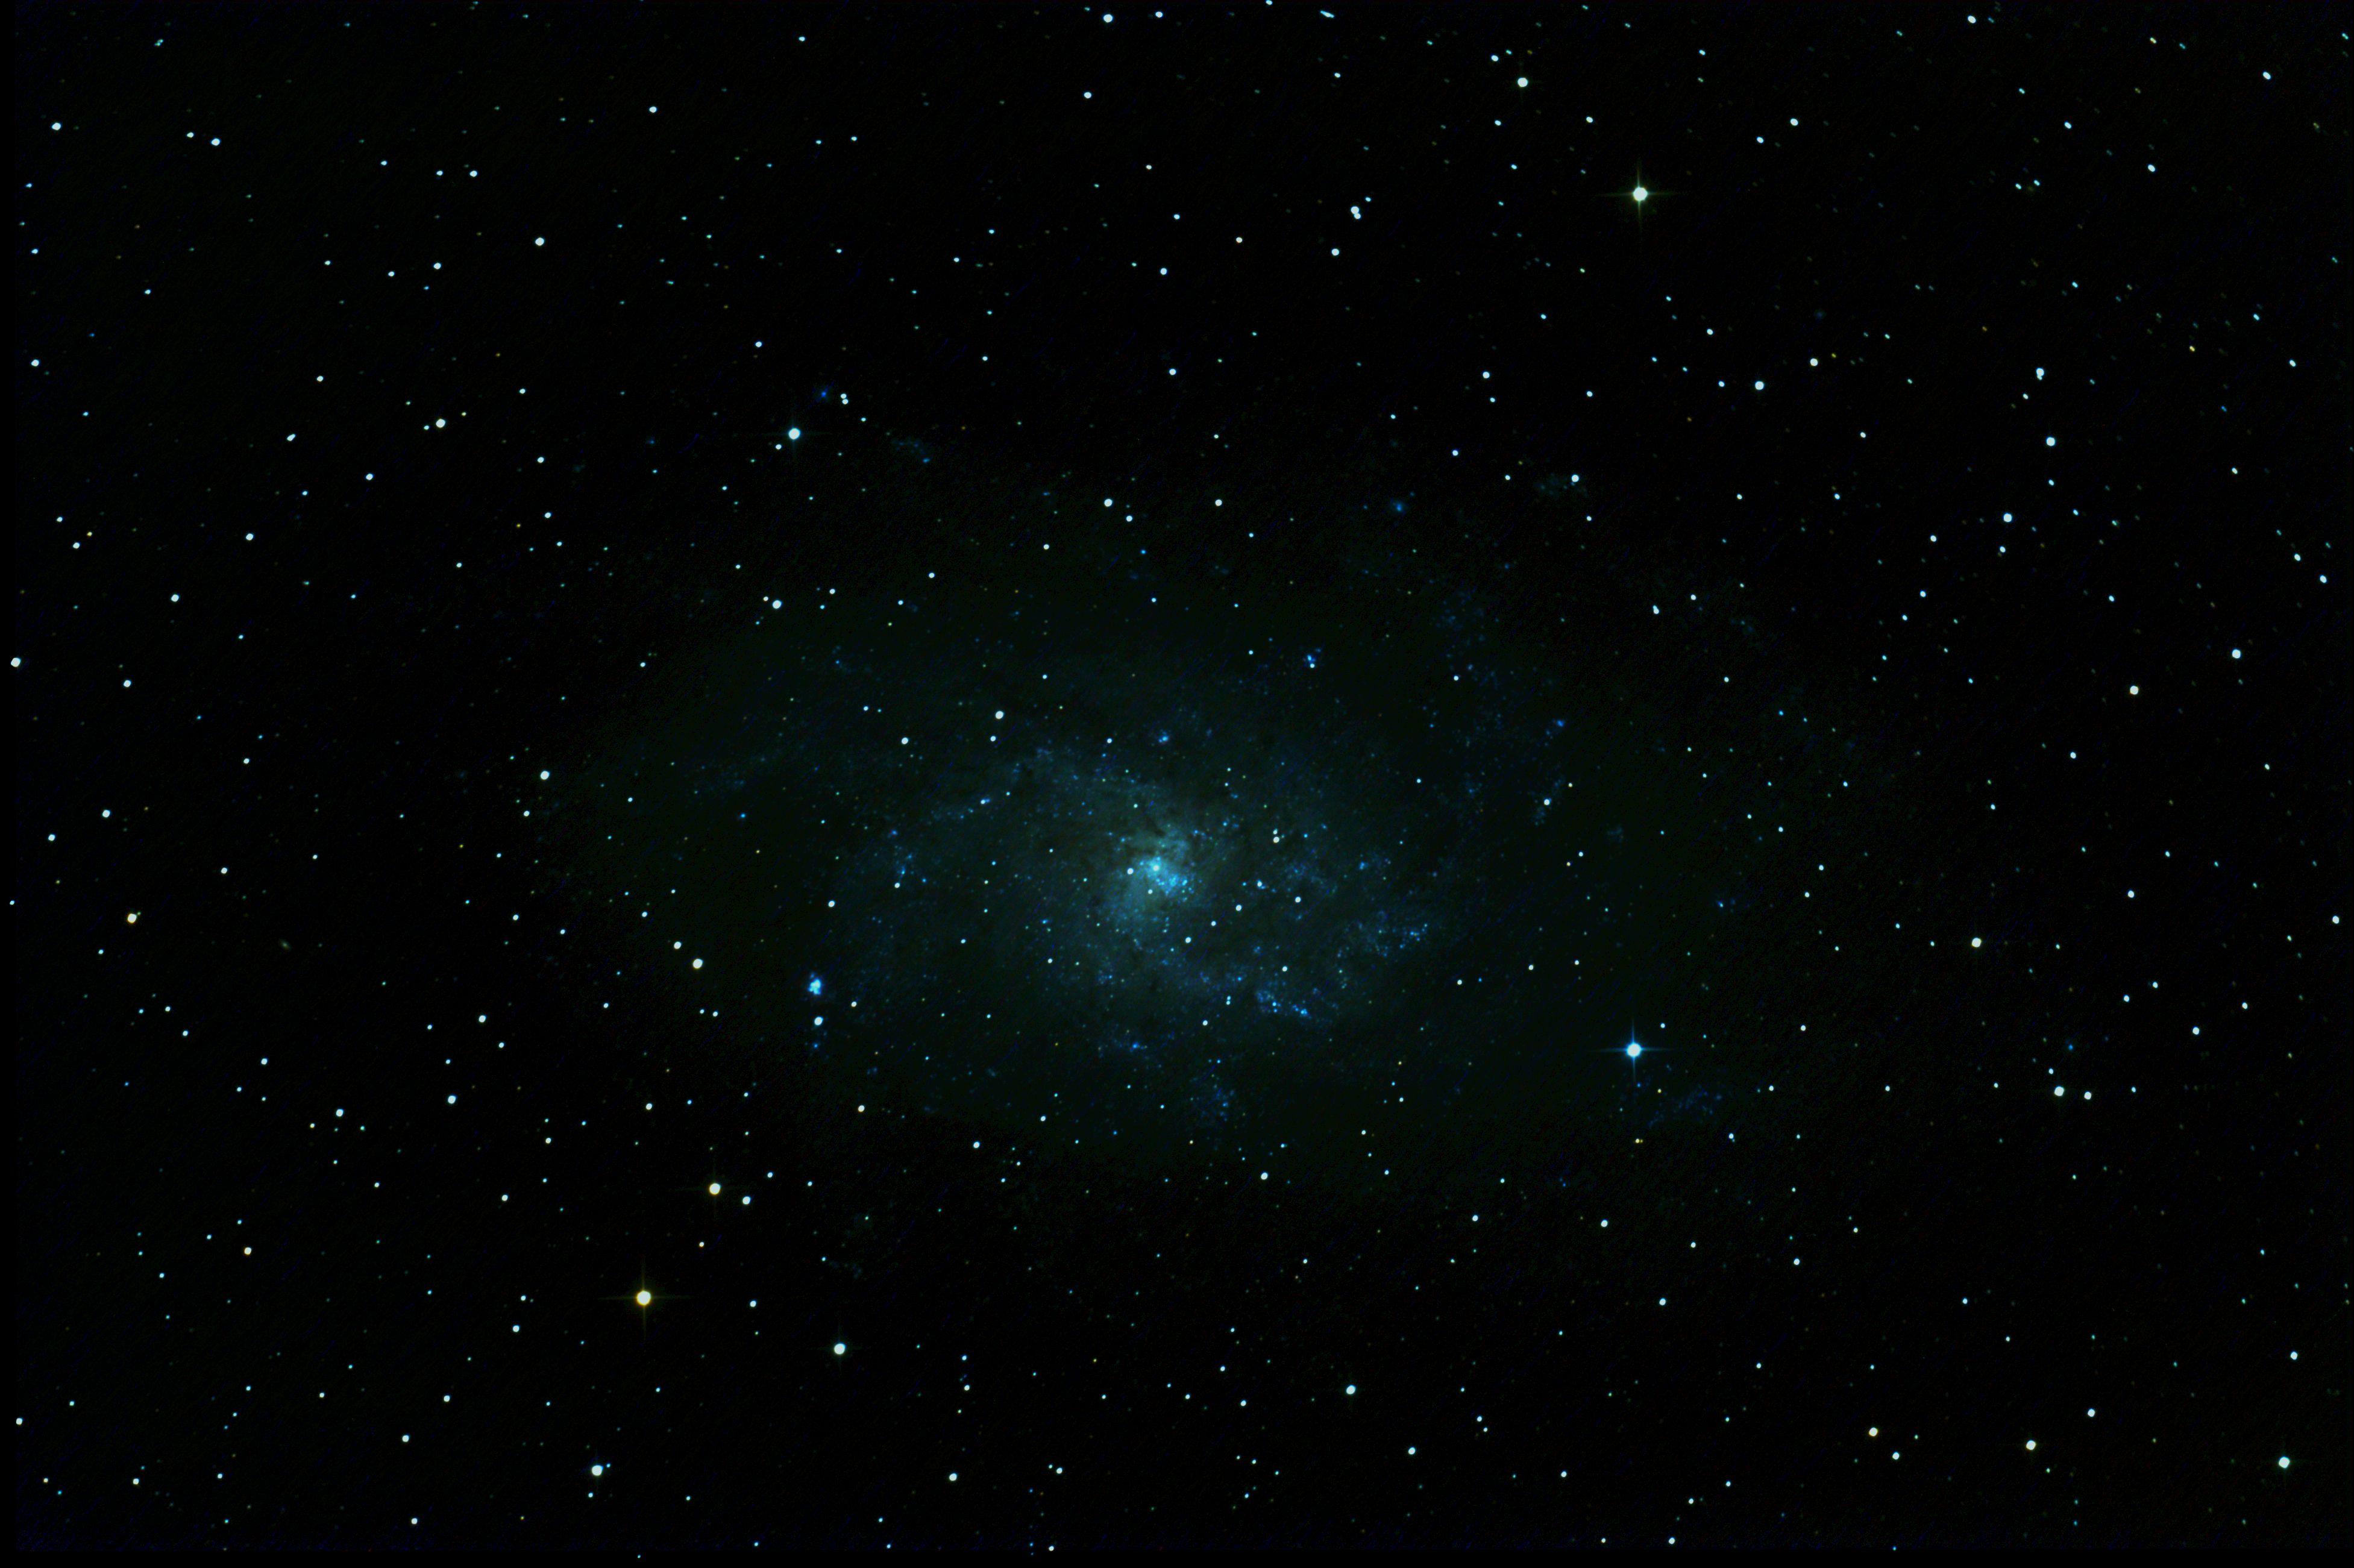 M33,DSS,sa20,lu,moy,45,93,RGB,RTX,ga2,RGB-Bal,Irvw,ga,co,sa,IRIS,bl